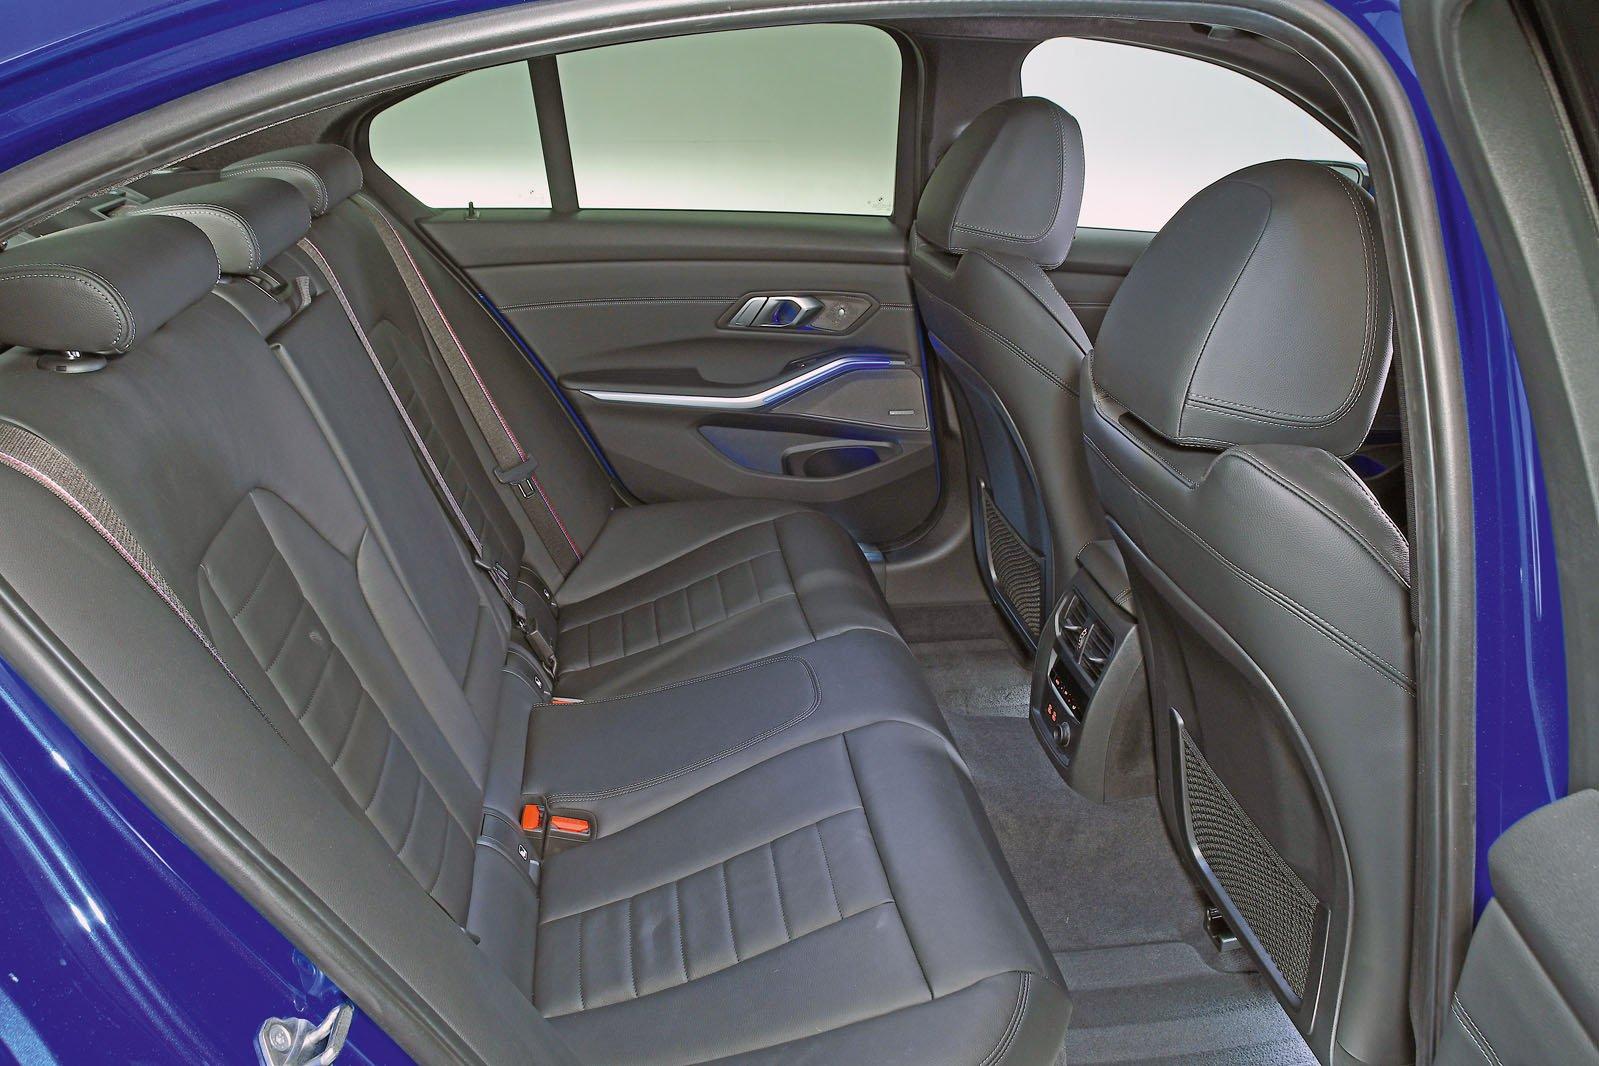 BMW 3 Series back seats